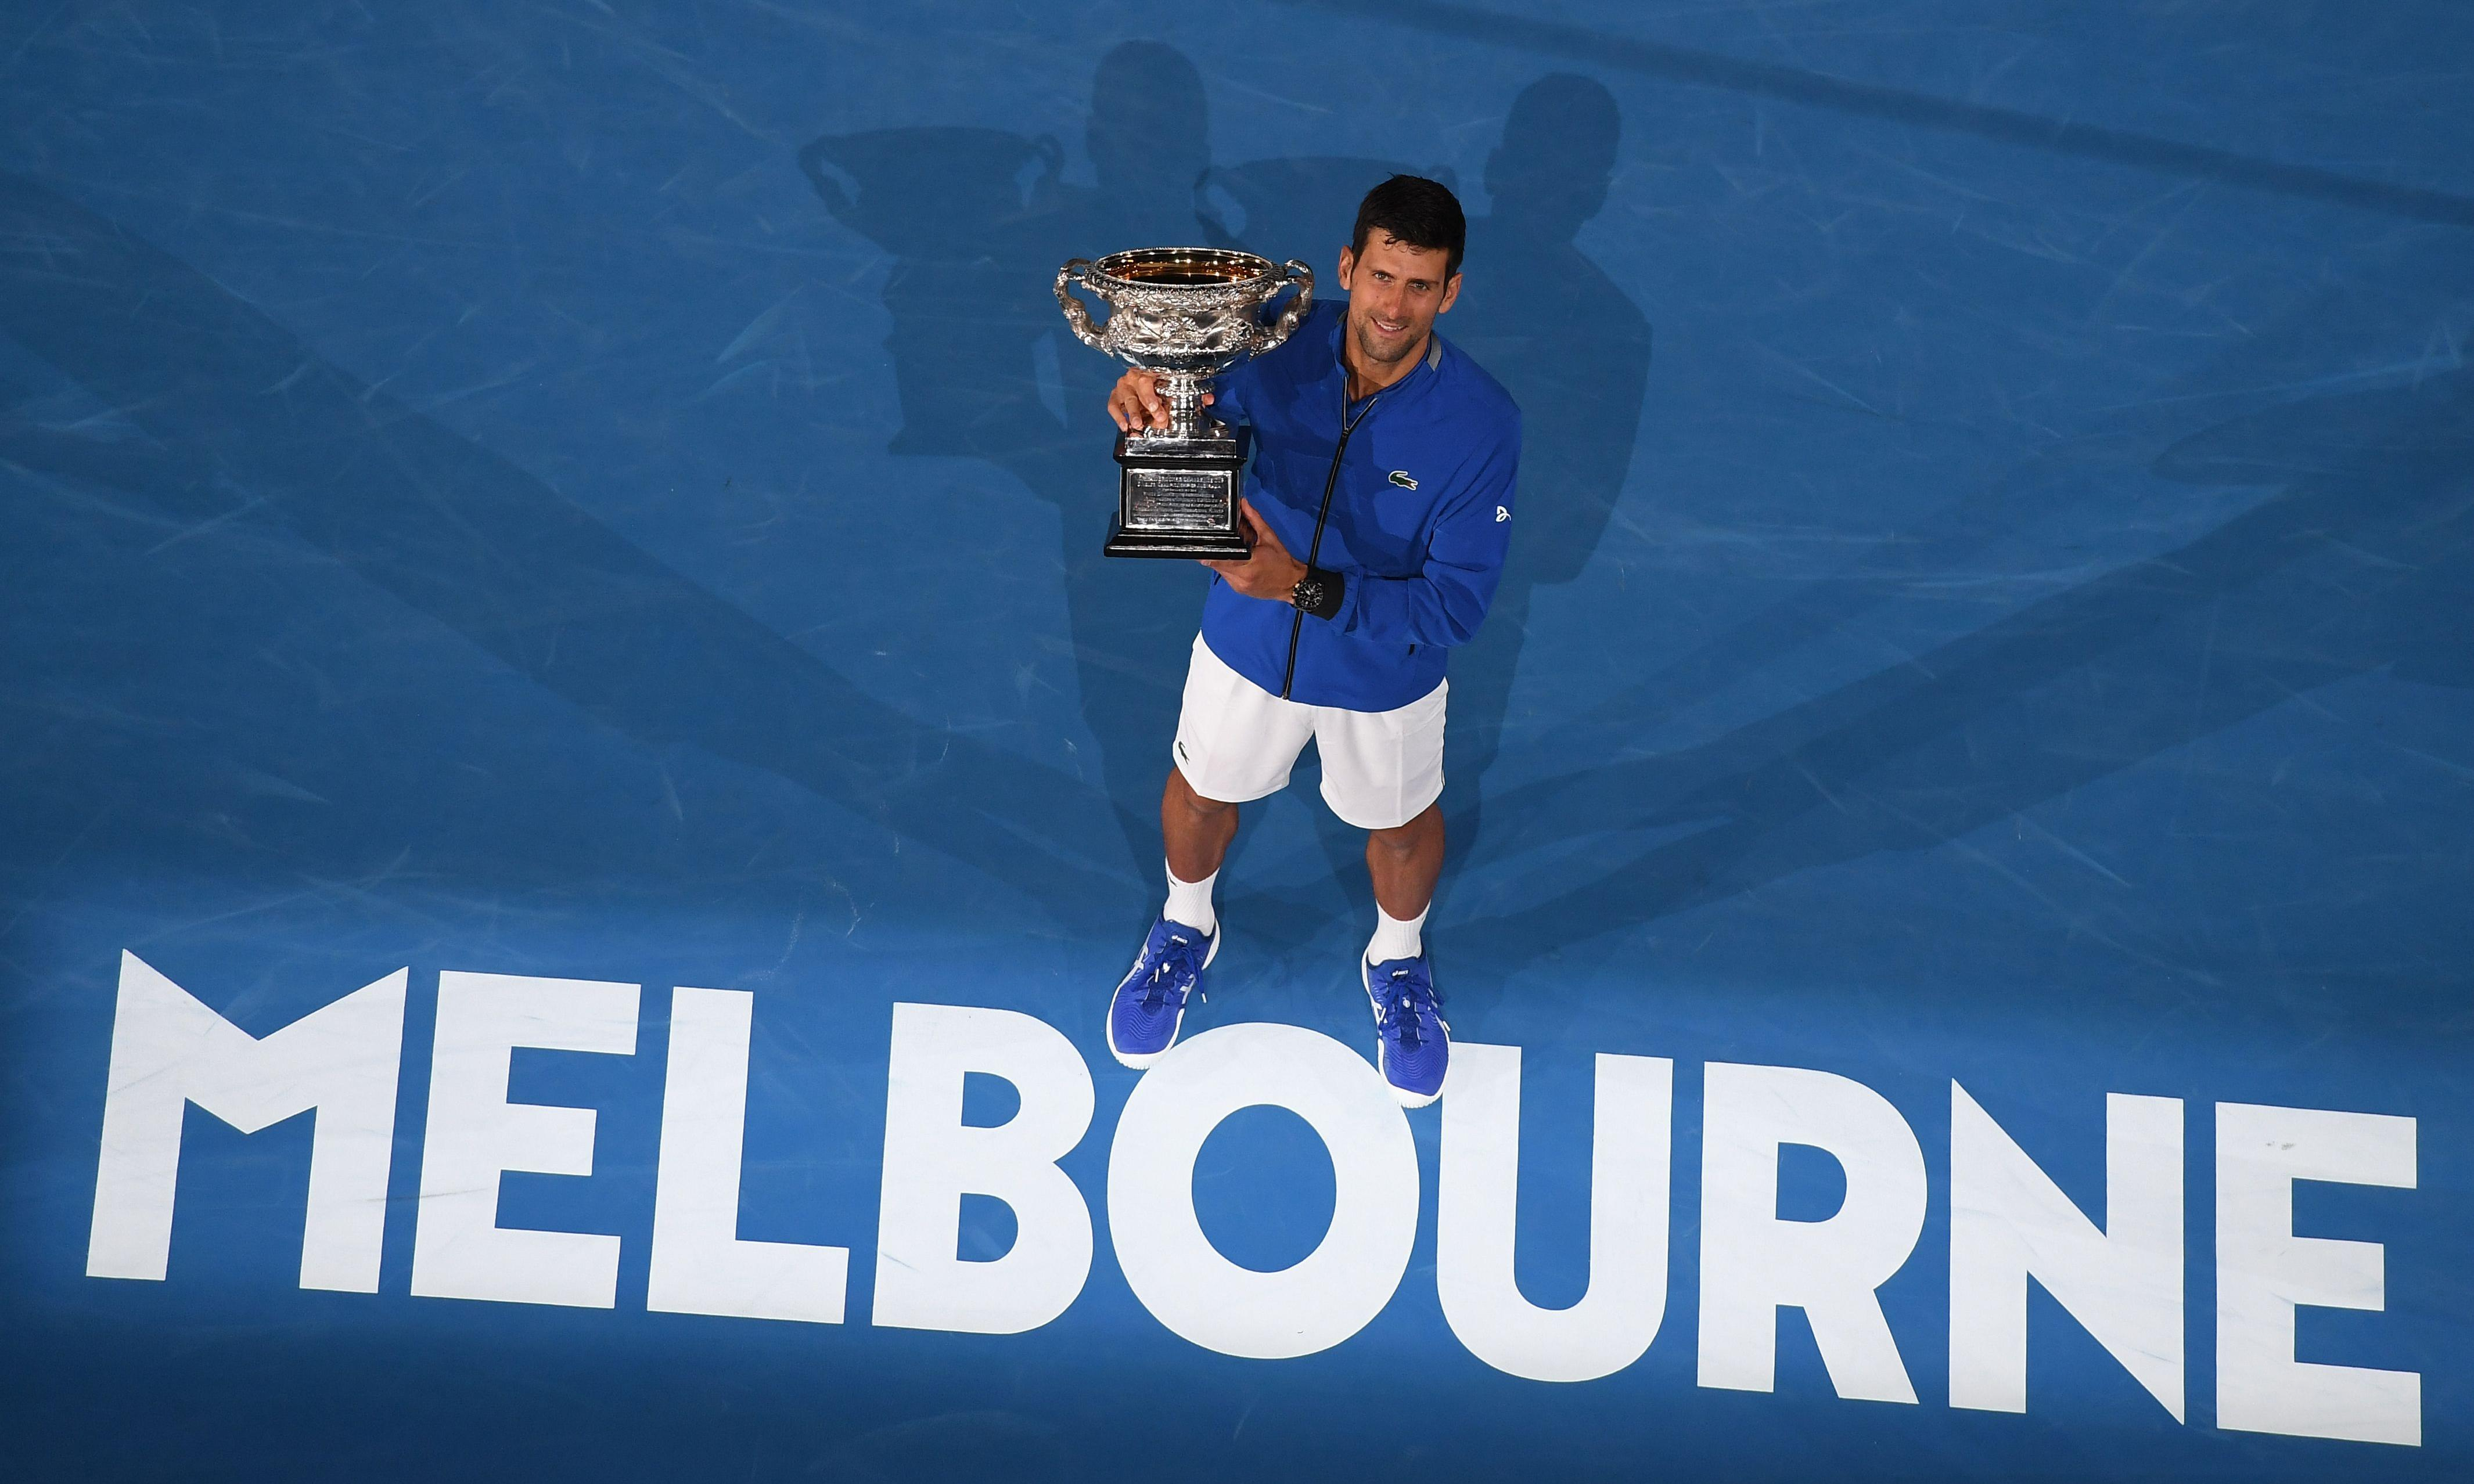 Novak Djokovic close to perfection as he wins seventh Australian Open title